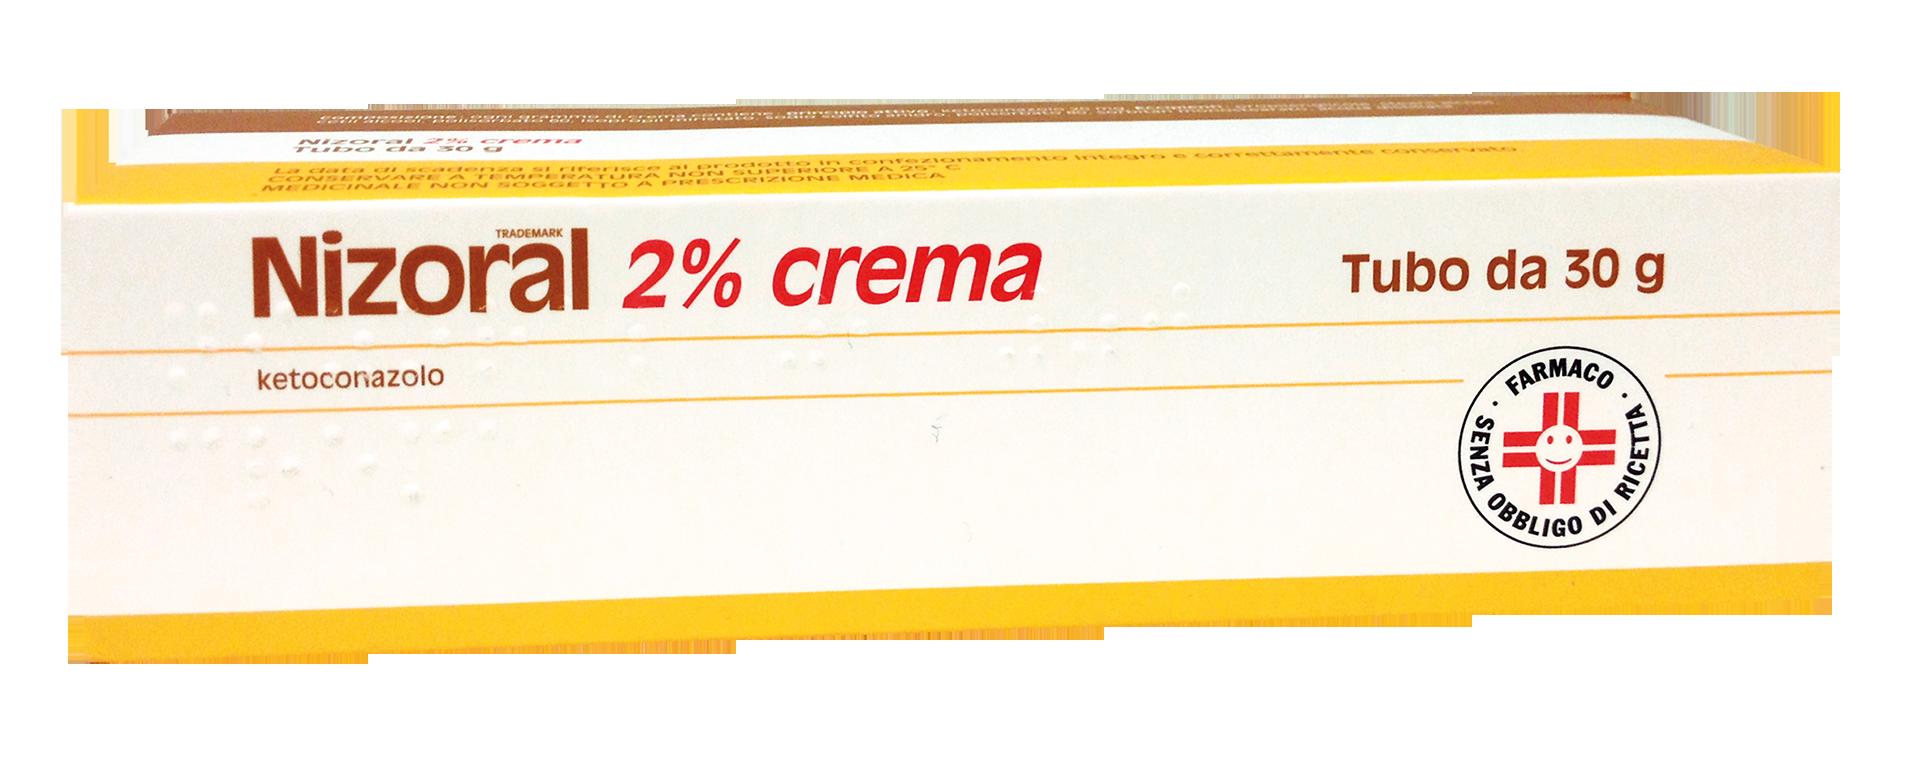 NIZORAL*CREMA DERM 30G 2% - farmaciafalquigolfoparadiso.it